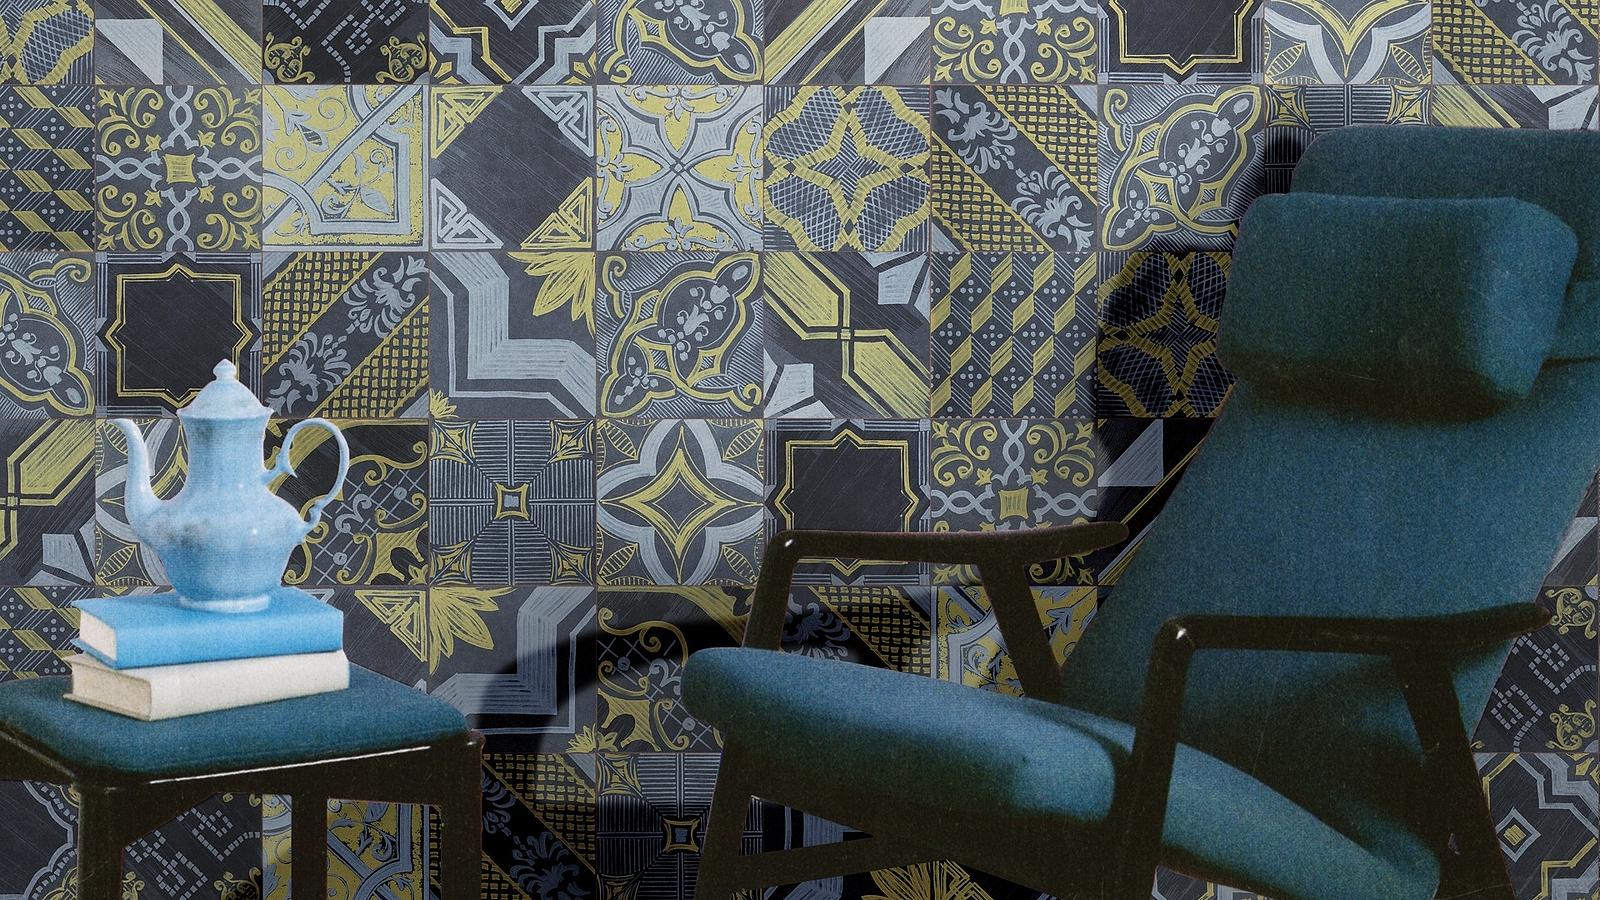 gr s c rame le riggiole de 14 ora italiana tile expert fournisseur de carrelage italien et. Black Bedroom Furniture Sets. Home Design Ideas